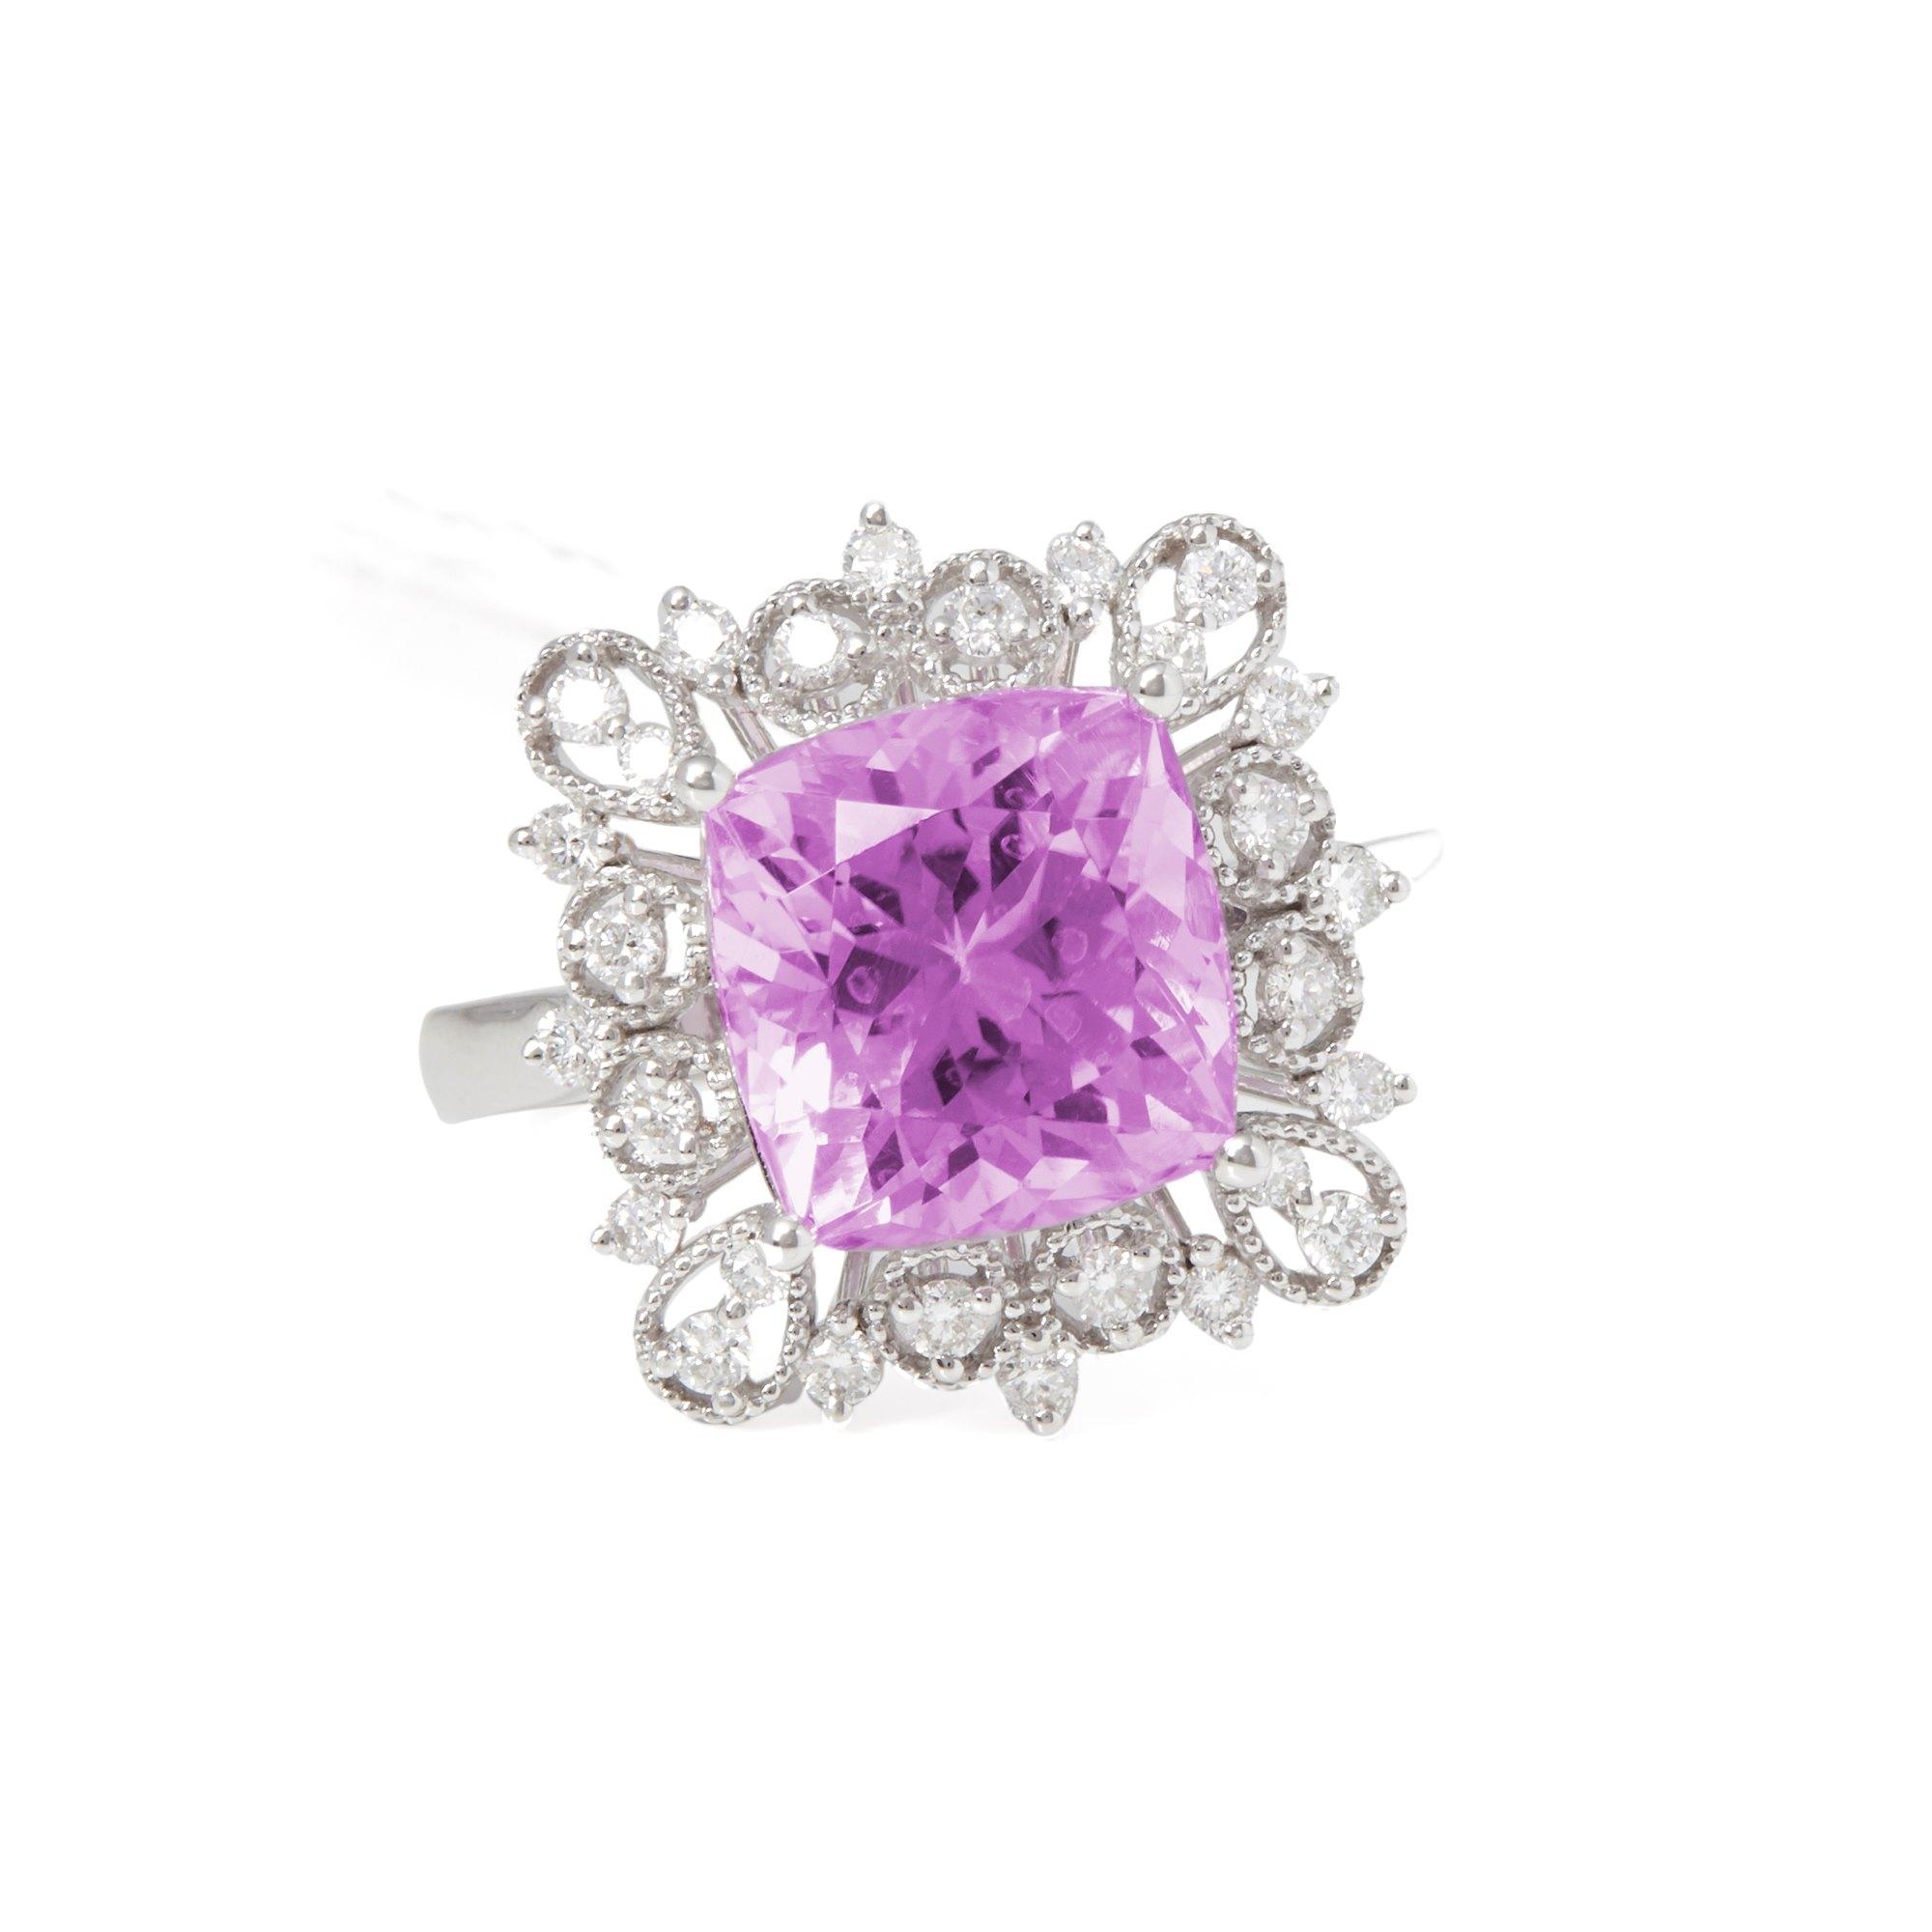 David Jerome Certified 5.91ct Cushion Cut Kunzite and Diamond 18ct Gold Ring